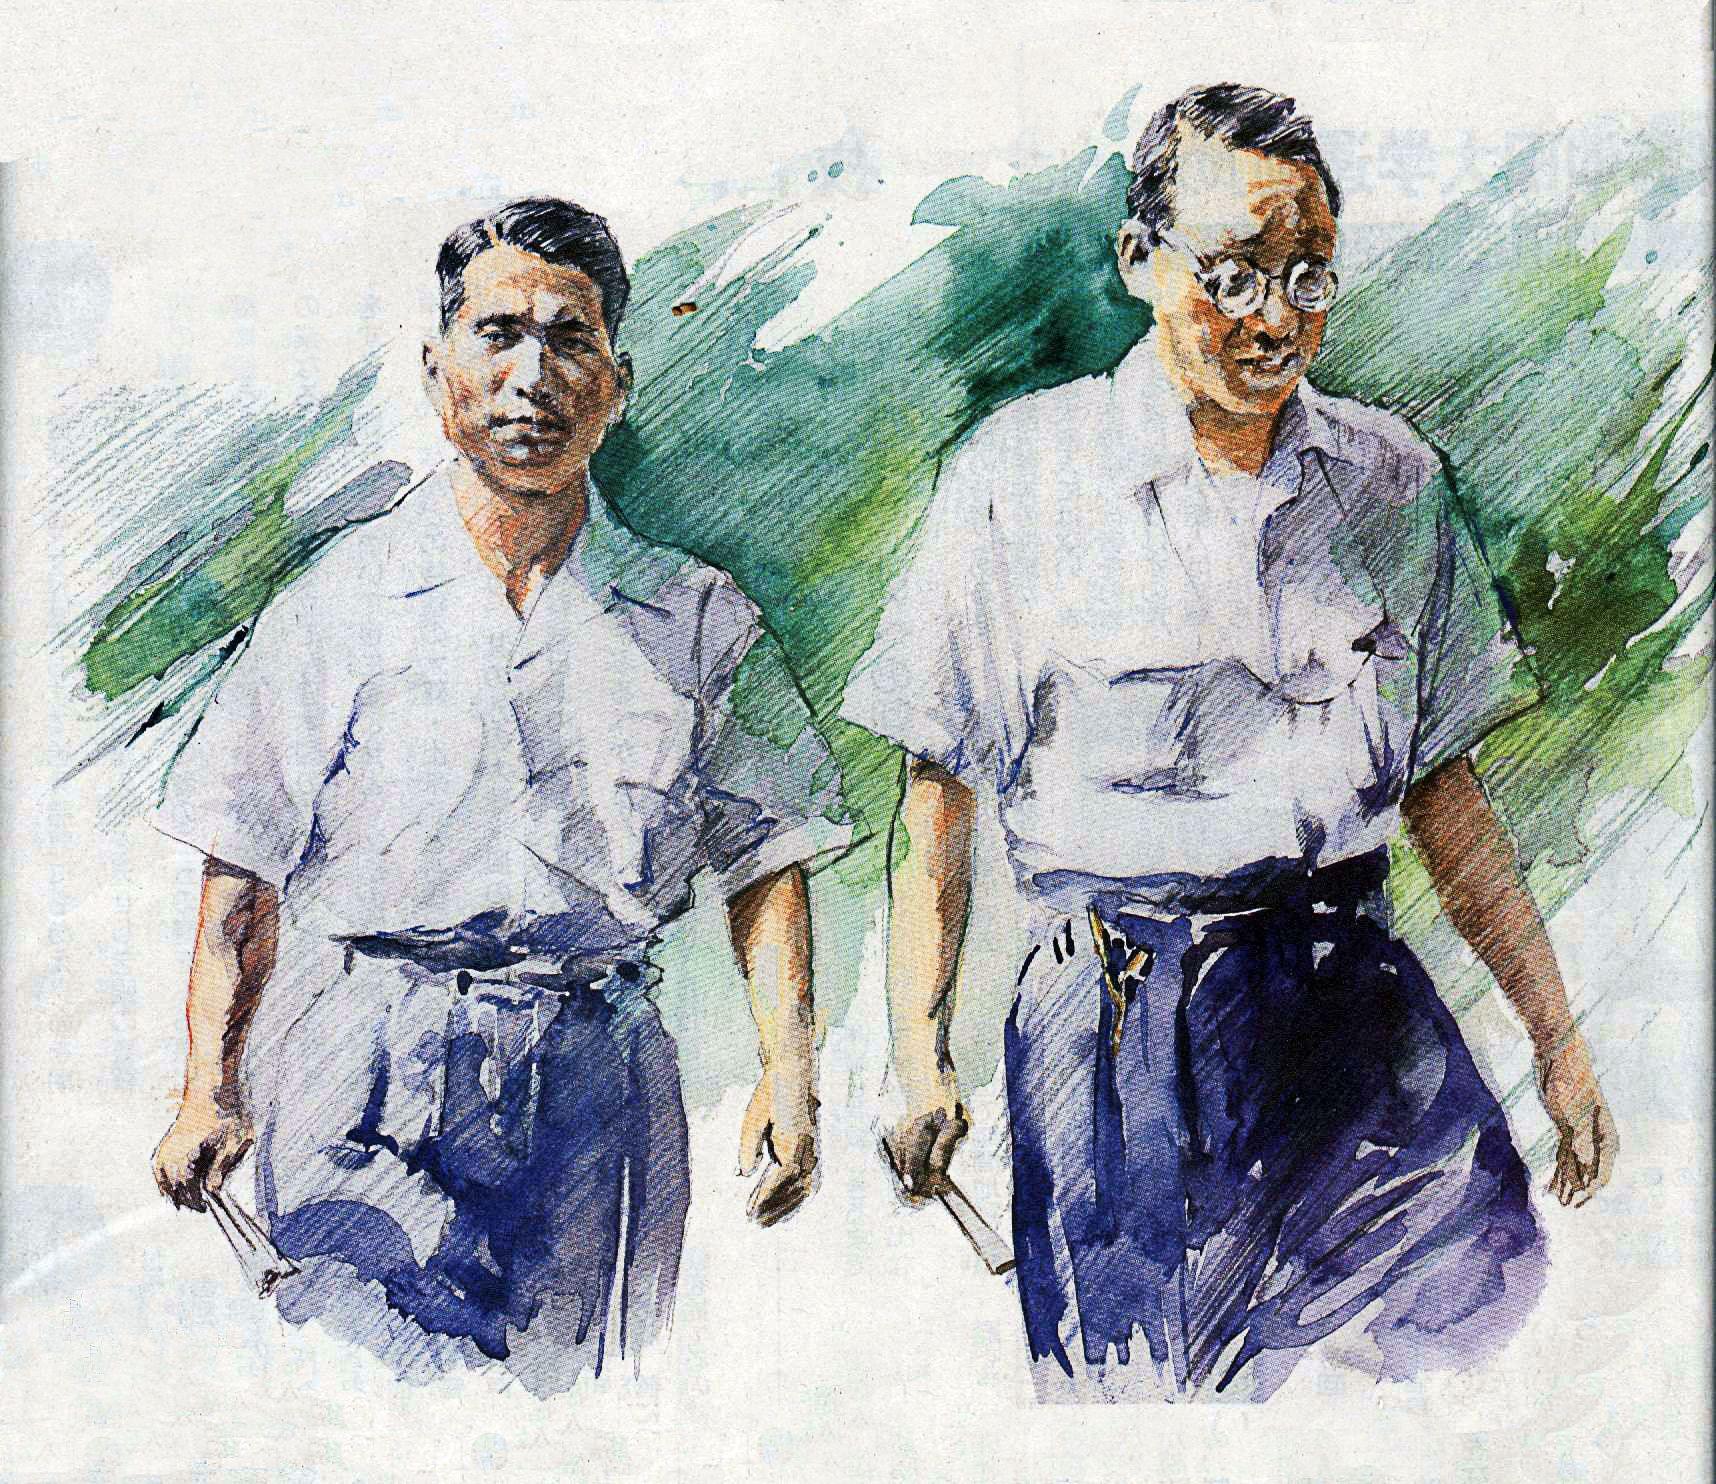 2nd and 3rd Soka Gakkai International Presidents. Josei Toda (R) and Daisaku Ikeda (L) - For more info visit: http://www.sgi-usa.org